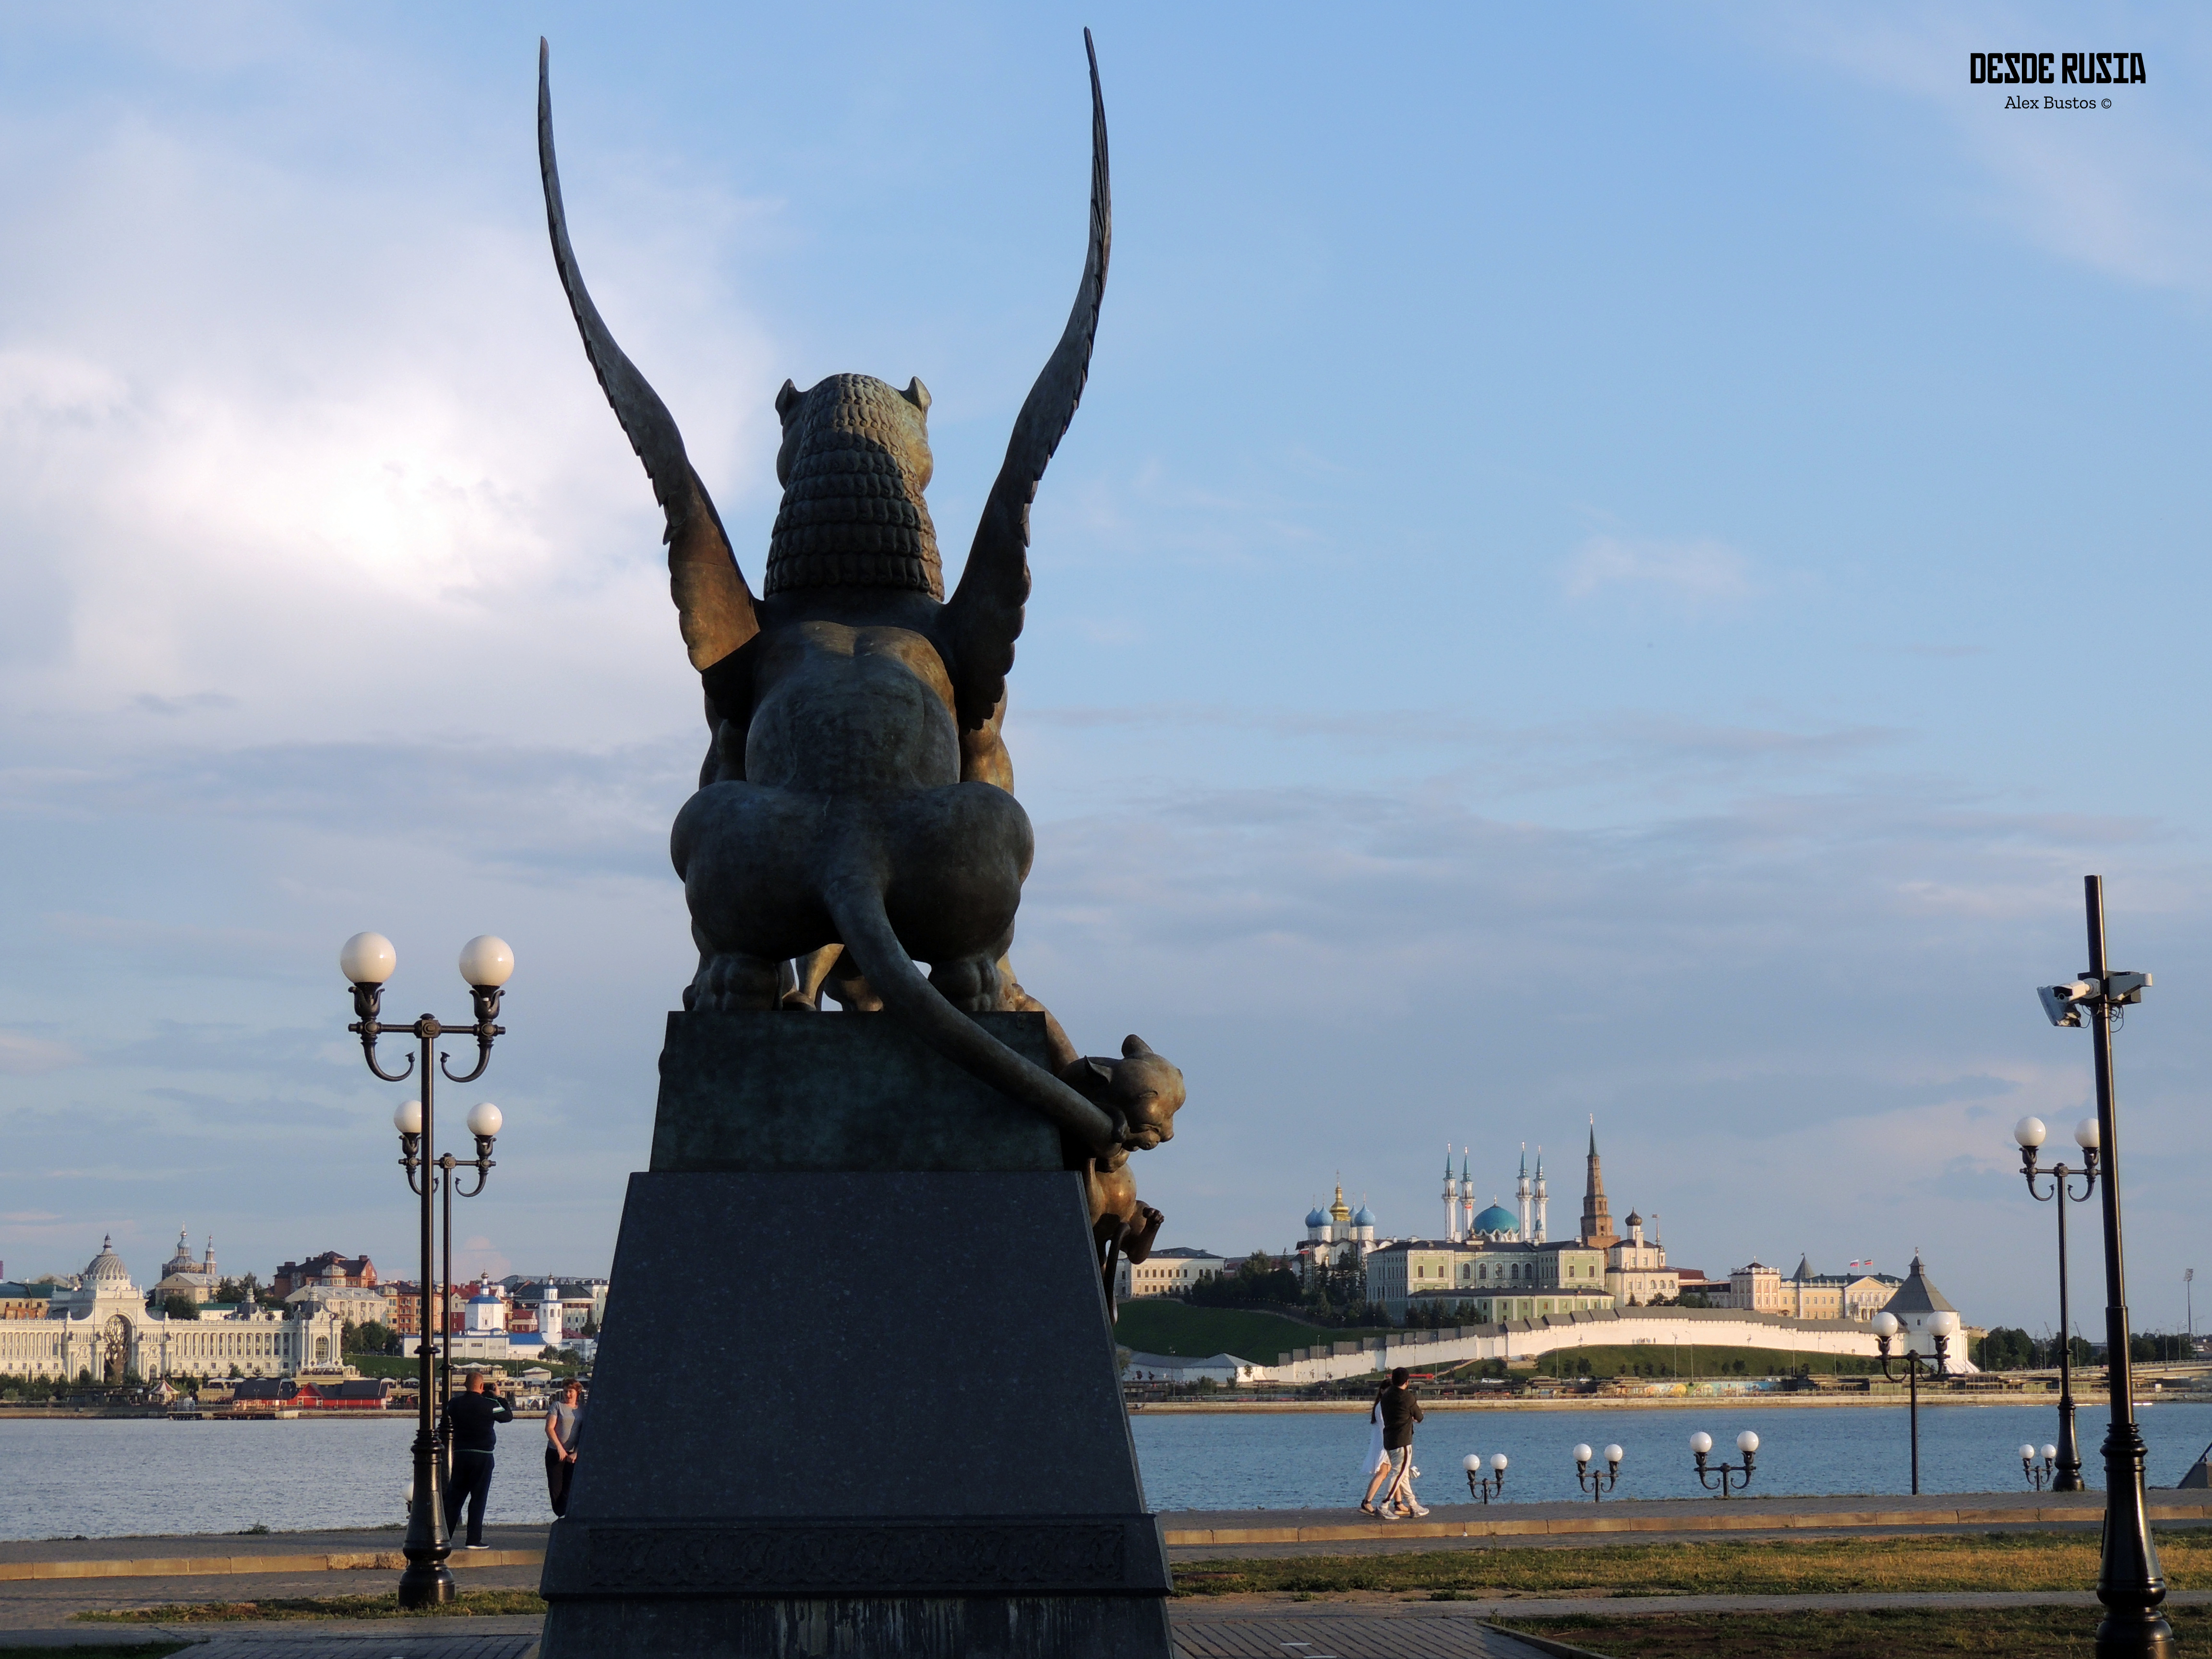 Estàtua_drac_-_background_kremlin